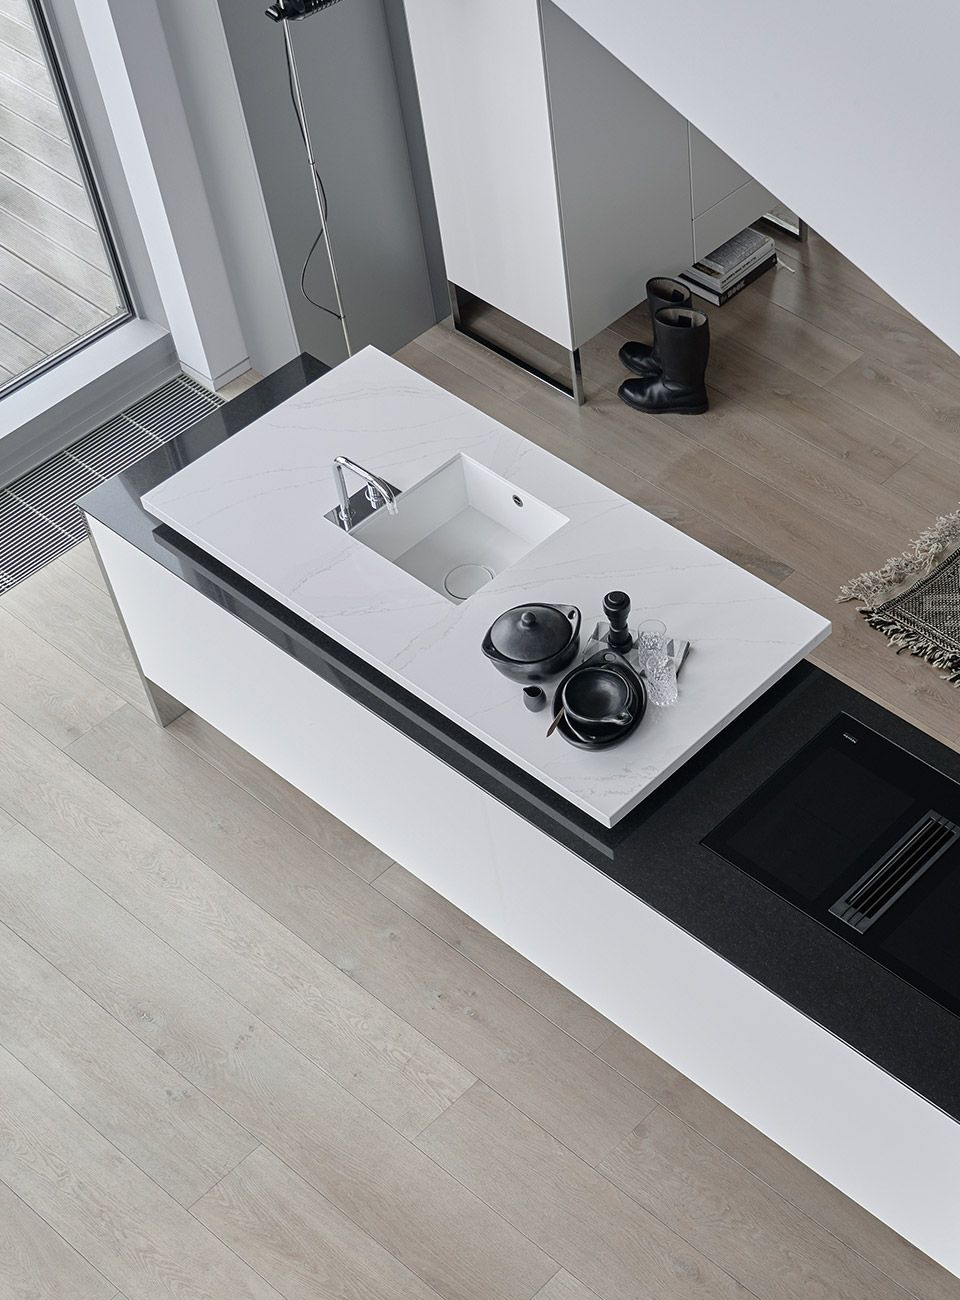 Küche +VENOVO Von Poggenpohl | Individuelles Küchendesign. Poggenpohl  Kitchen Cabinets. Awesome, Mid